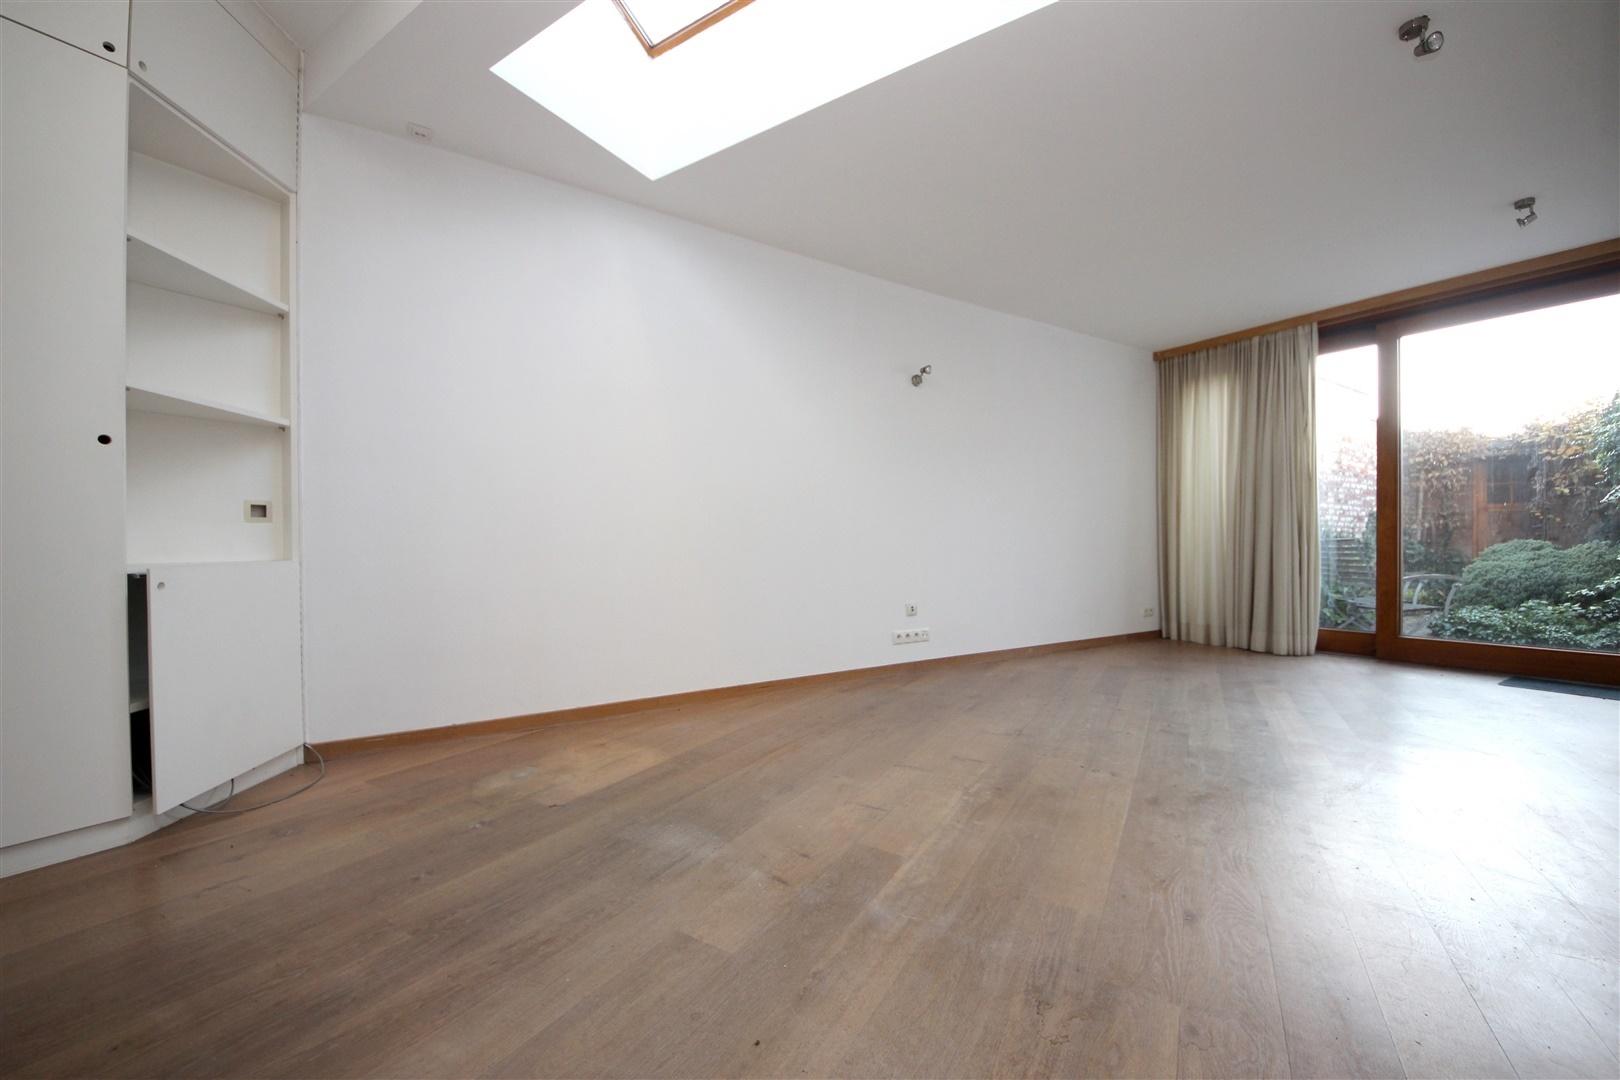 Gezellige woning met 2 slaapkamers in Gentbrugge